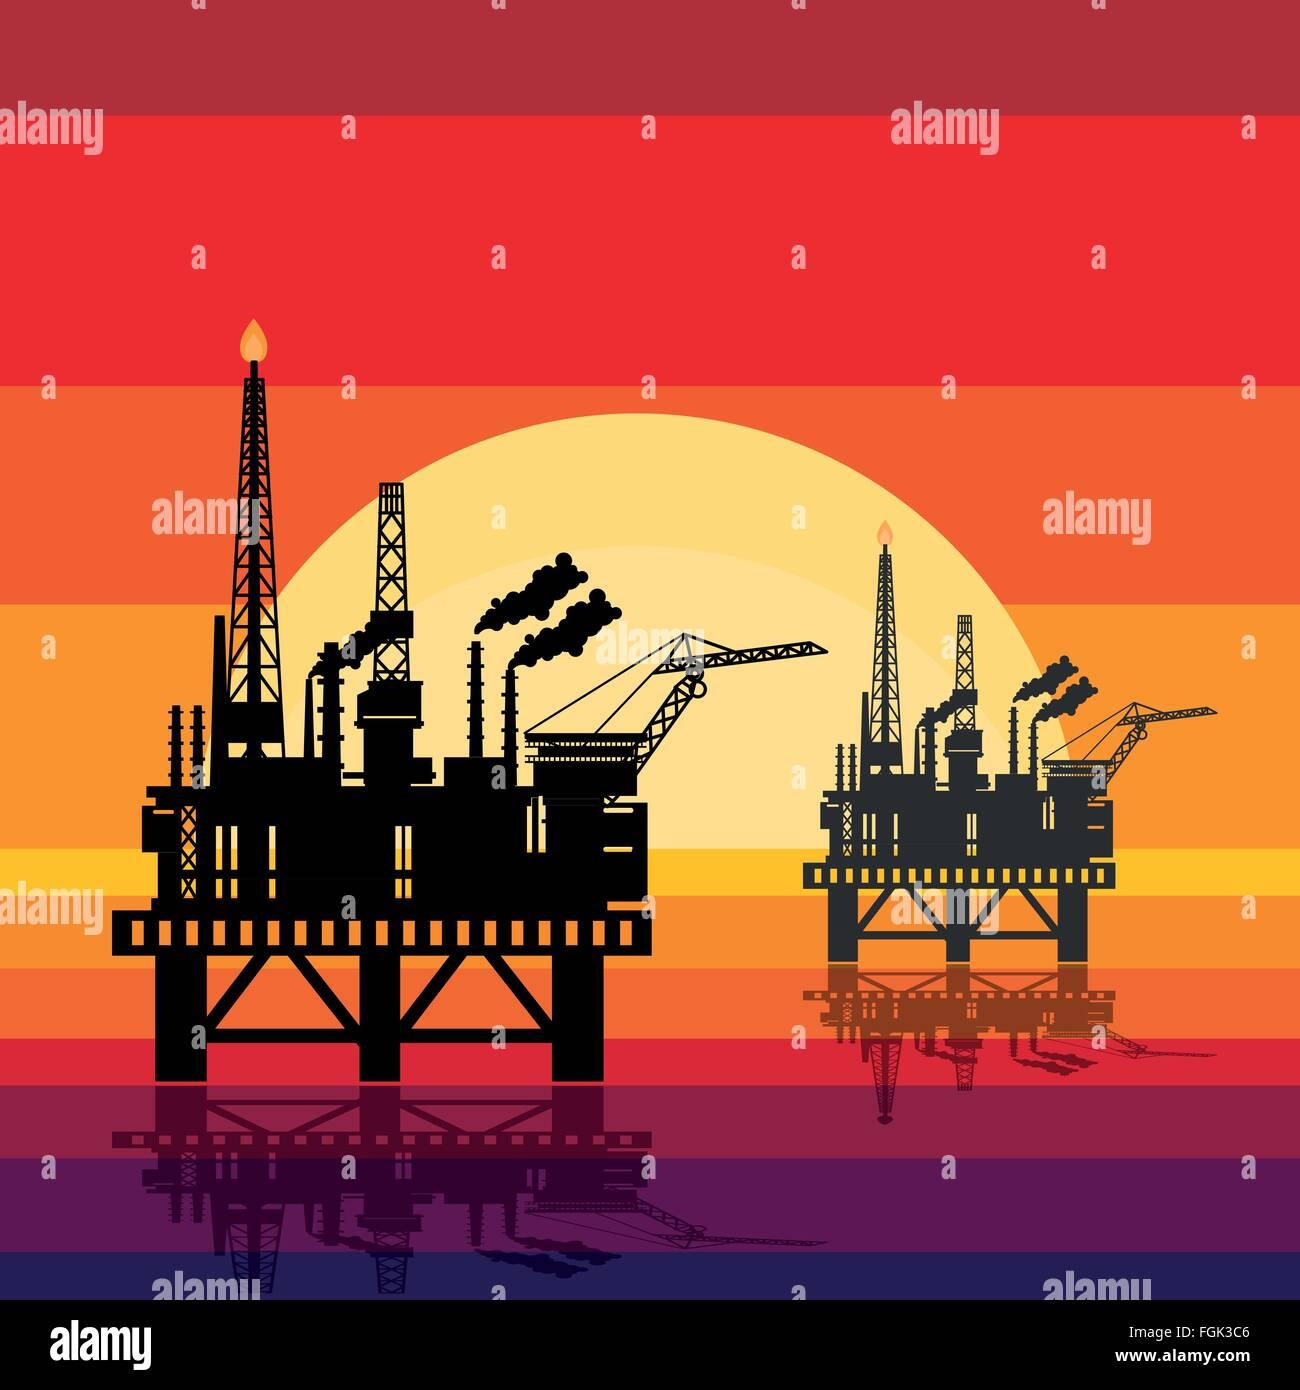 Offshore oil platform design concept set with petroleum. Helipad, cranes, derrick, hull column, lifeboat, workshop, - Stock Vector